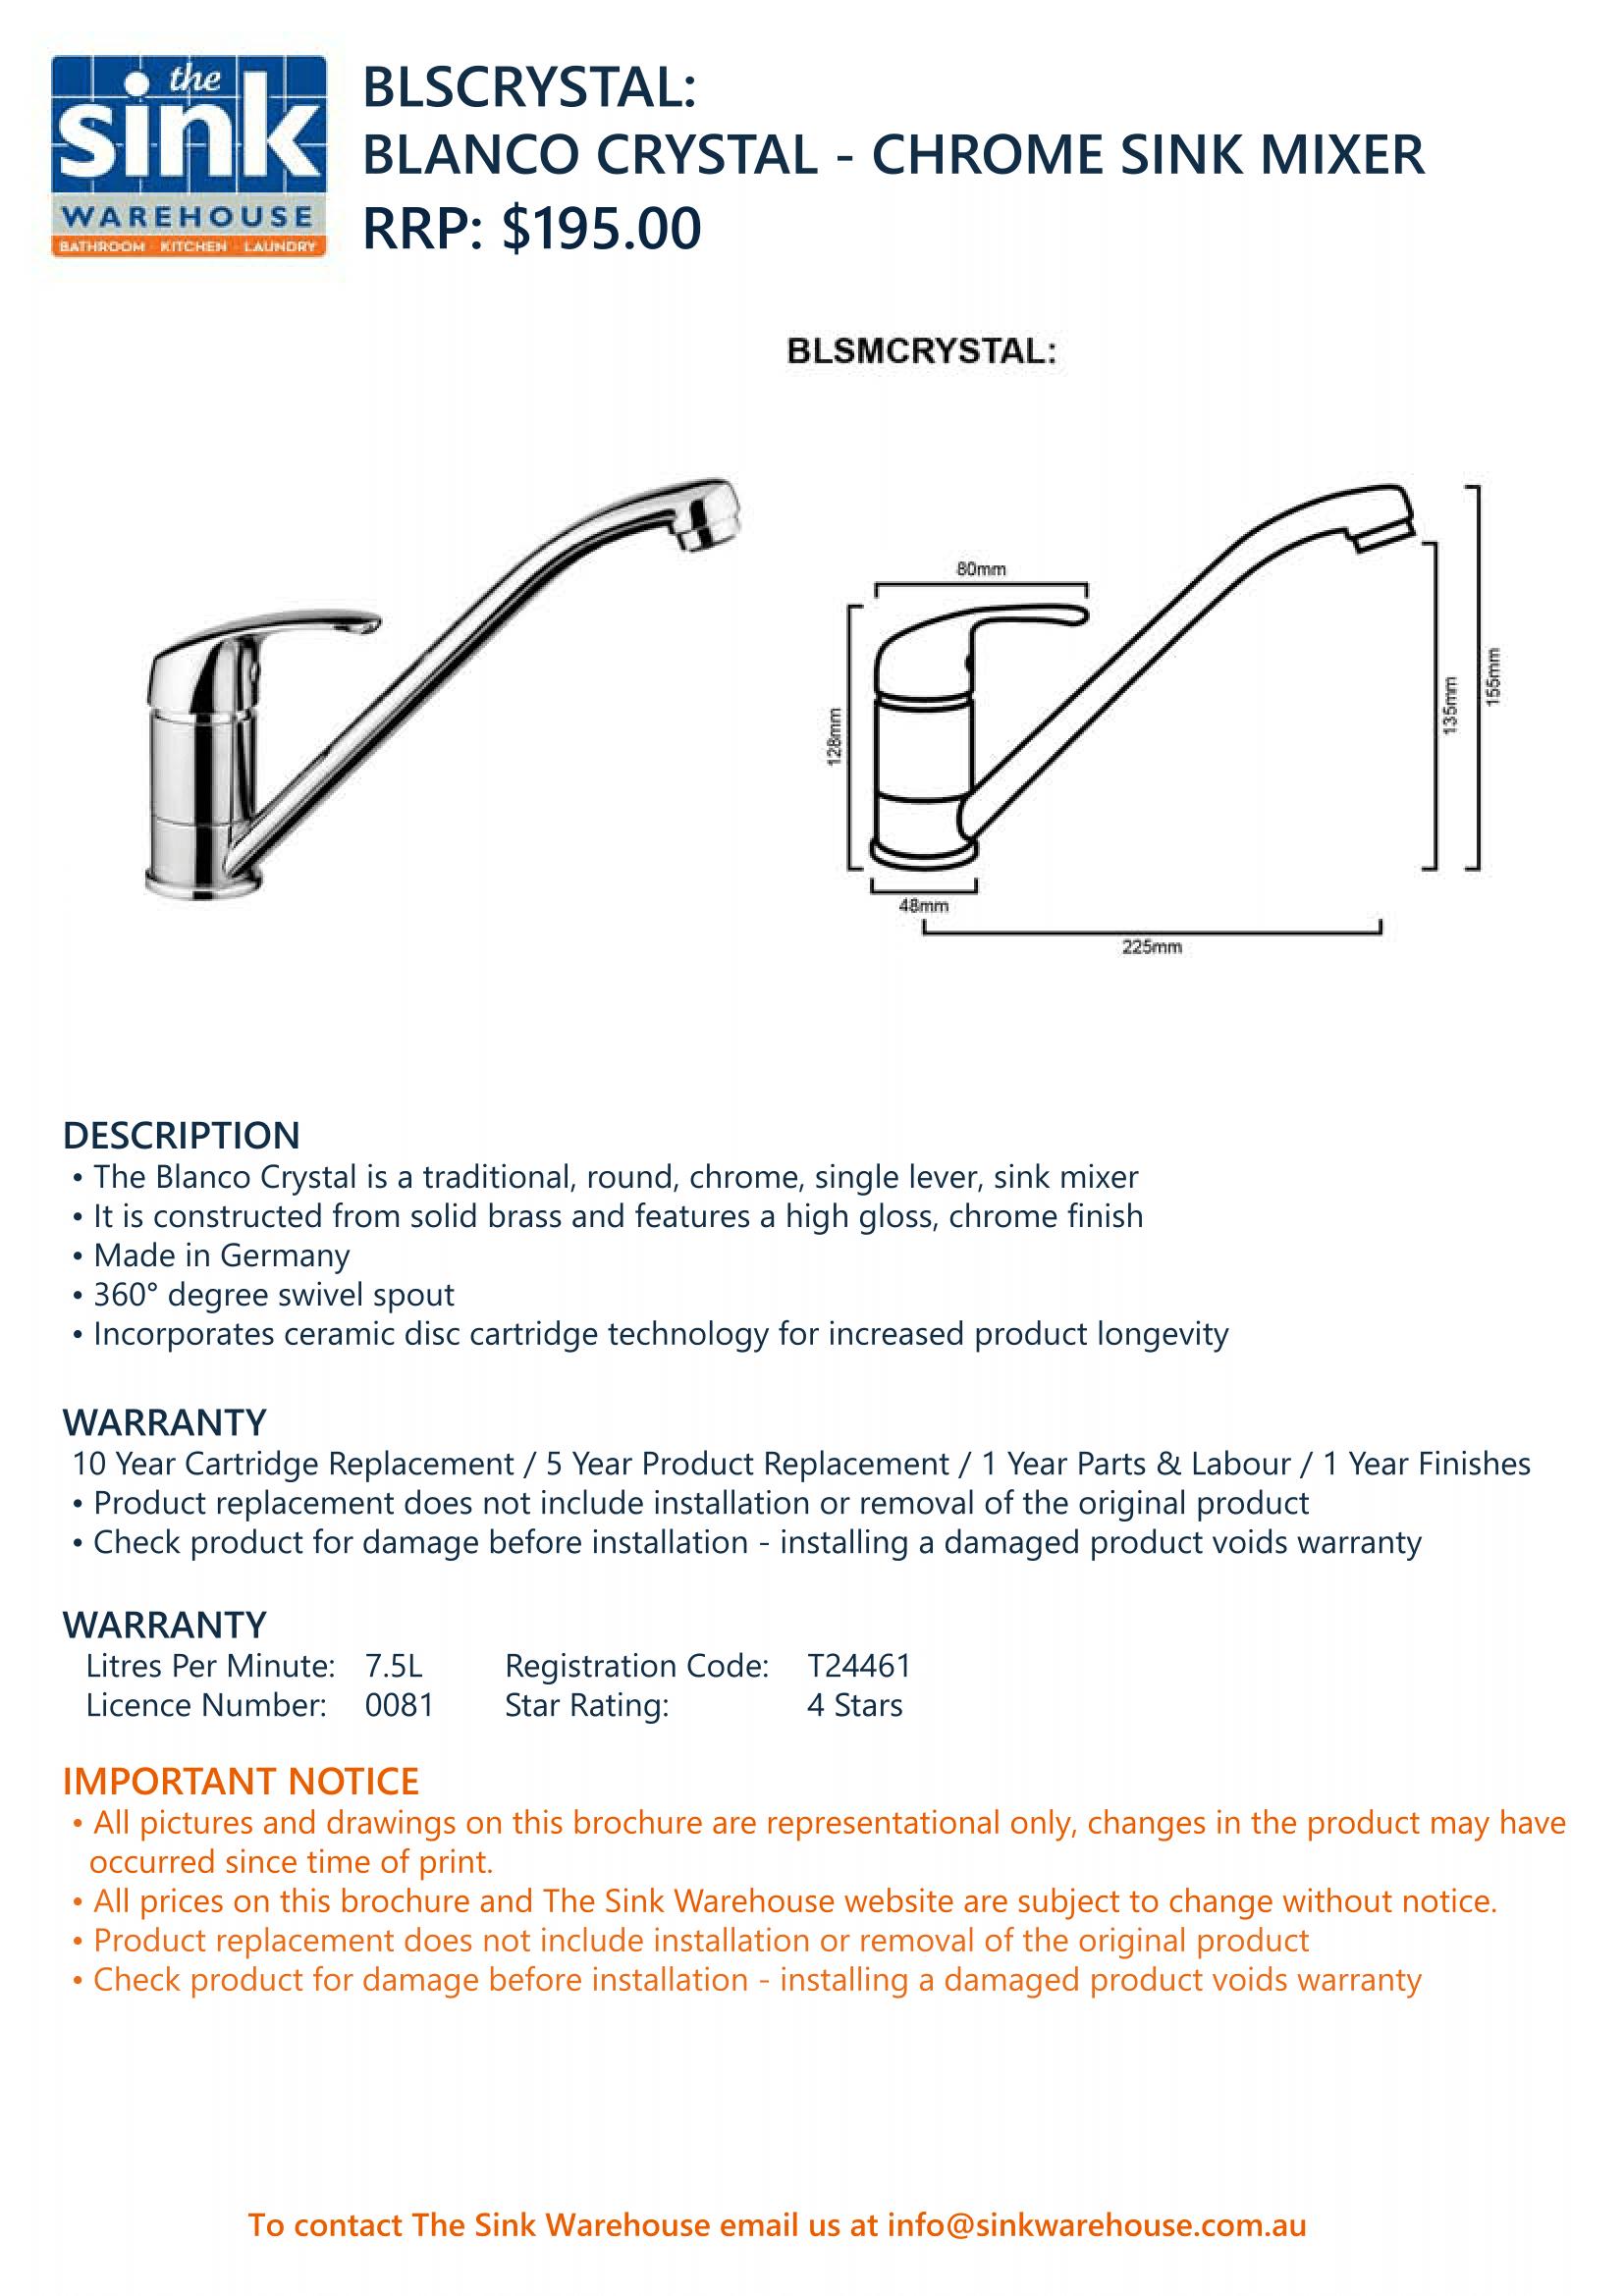 blscrystal-product-spec-sheet-1.png